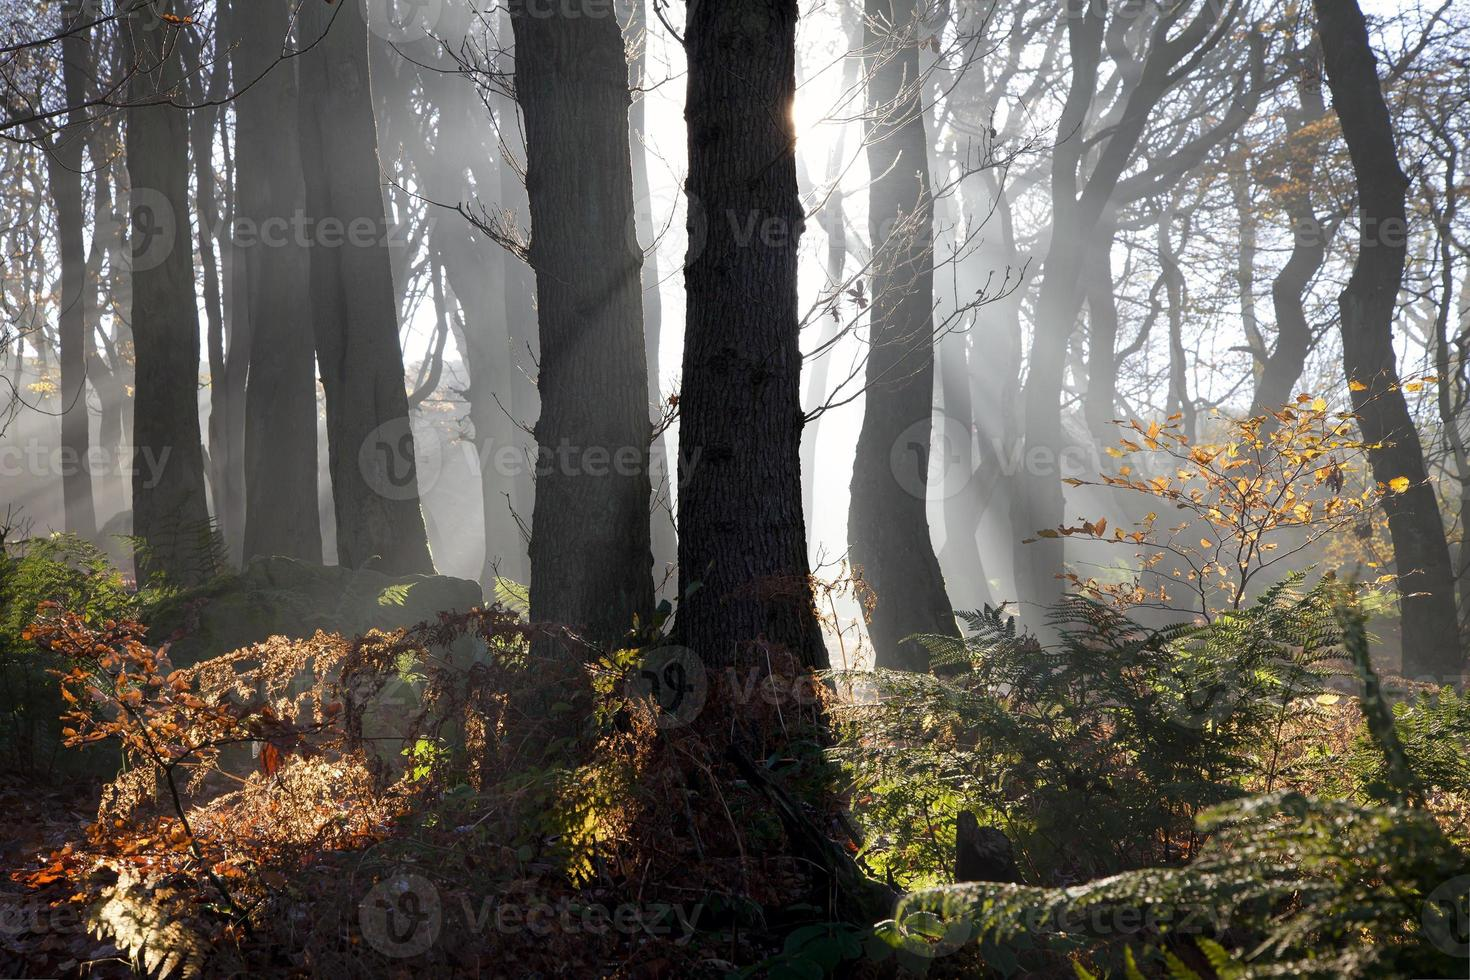 boschi nebbiosi foto